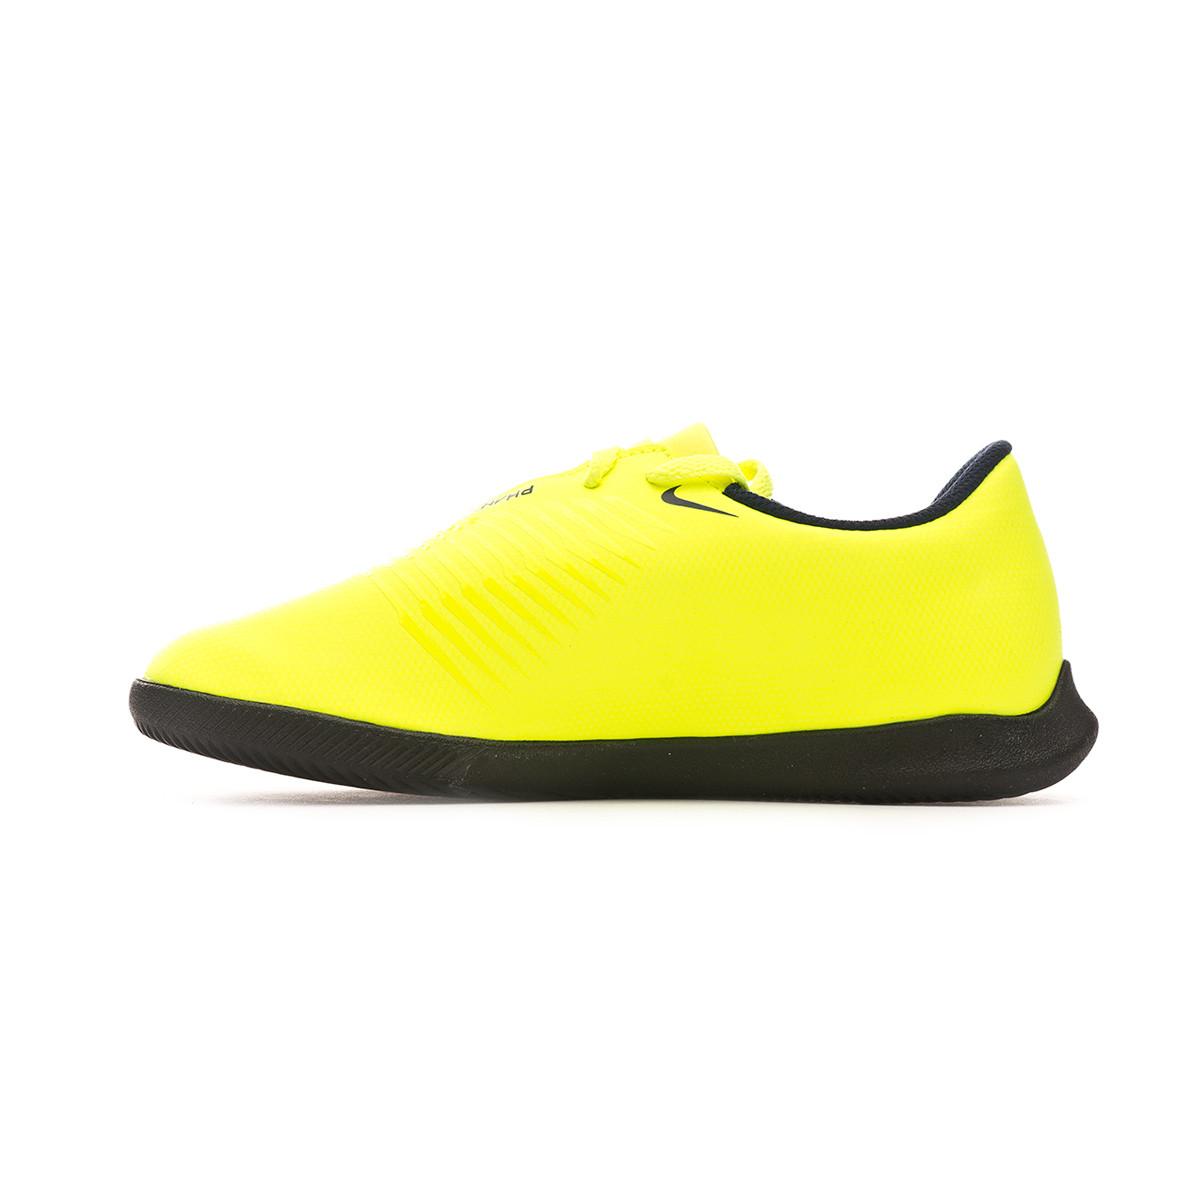 más lejos Novela de suspenso energía  Futsal Boot Nike Phantom Venom Club IC Niño Volt-Obsidian - Football store  Fútbol Emotion